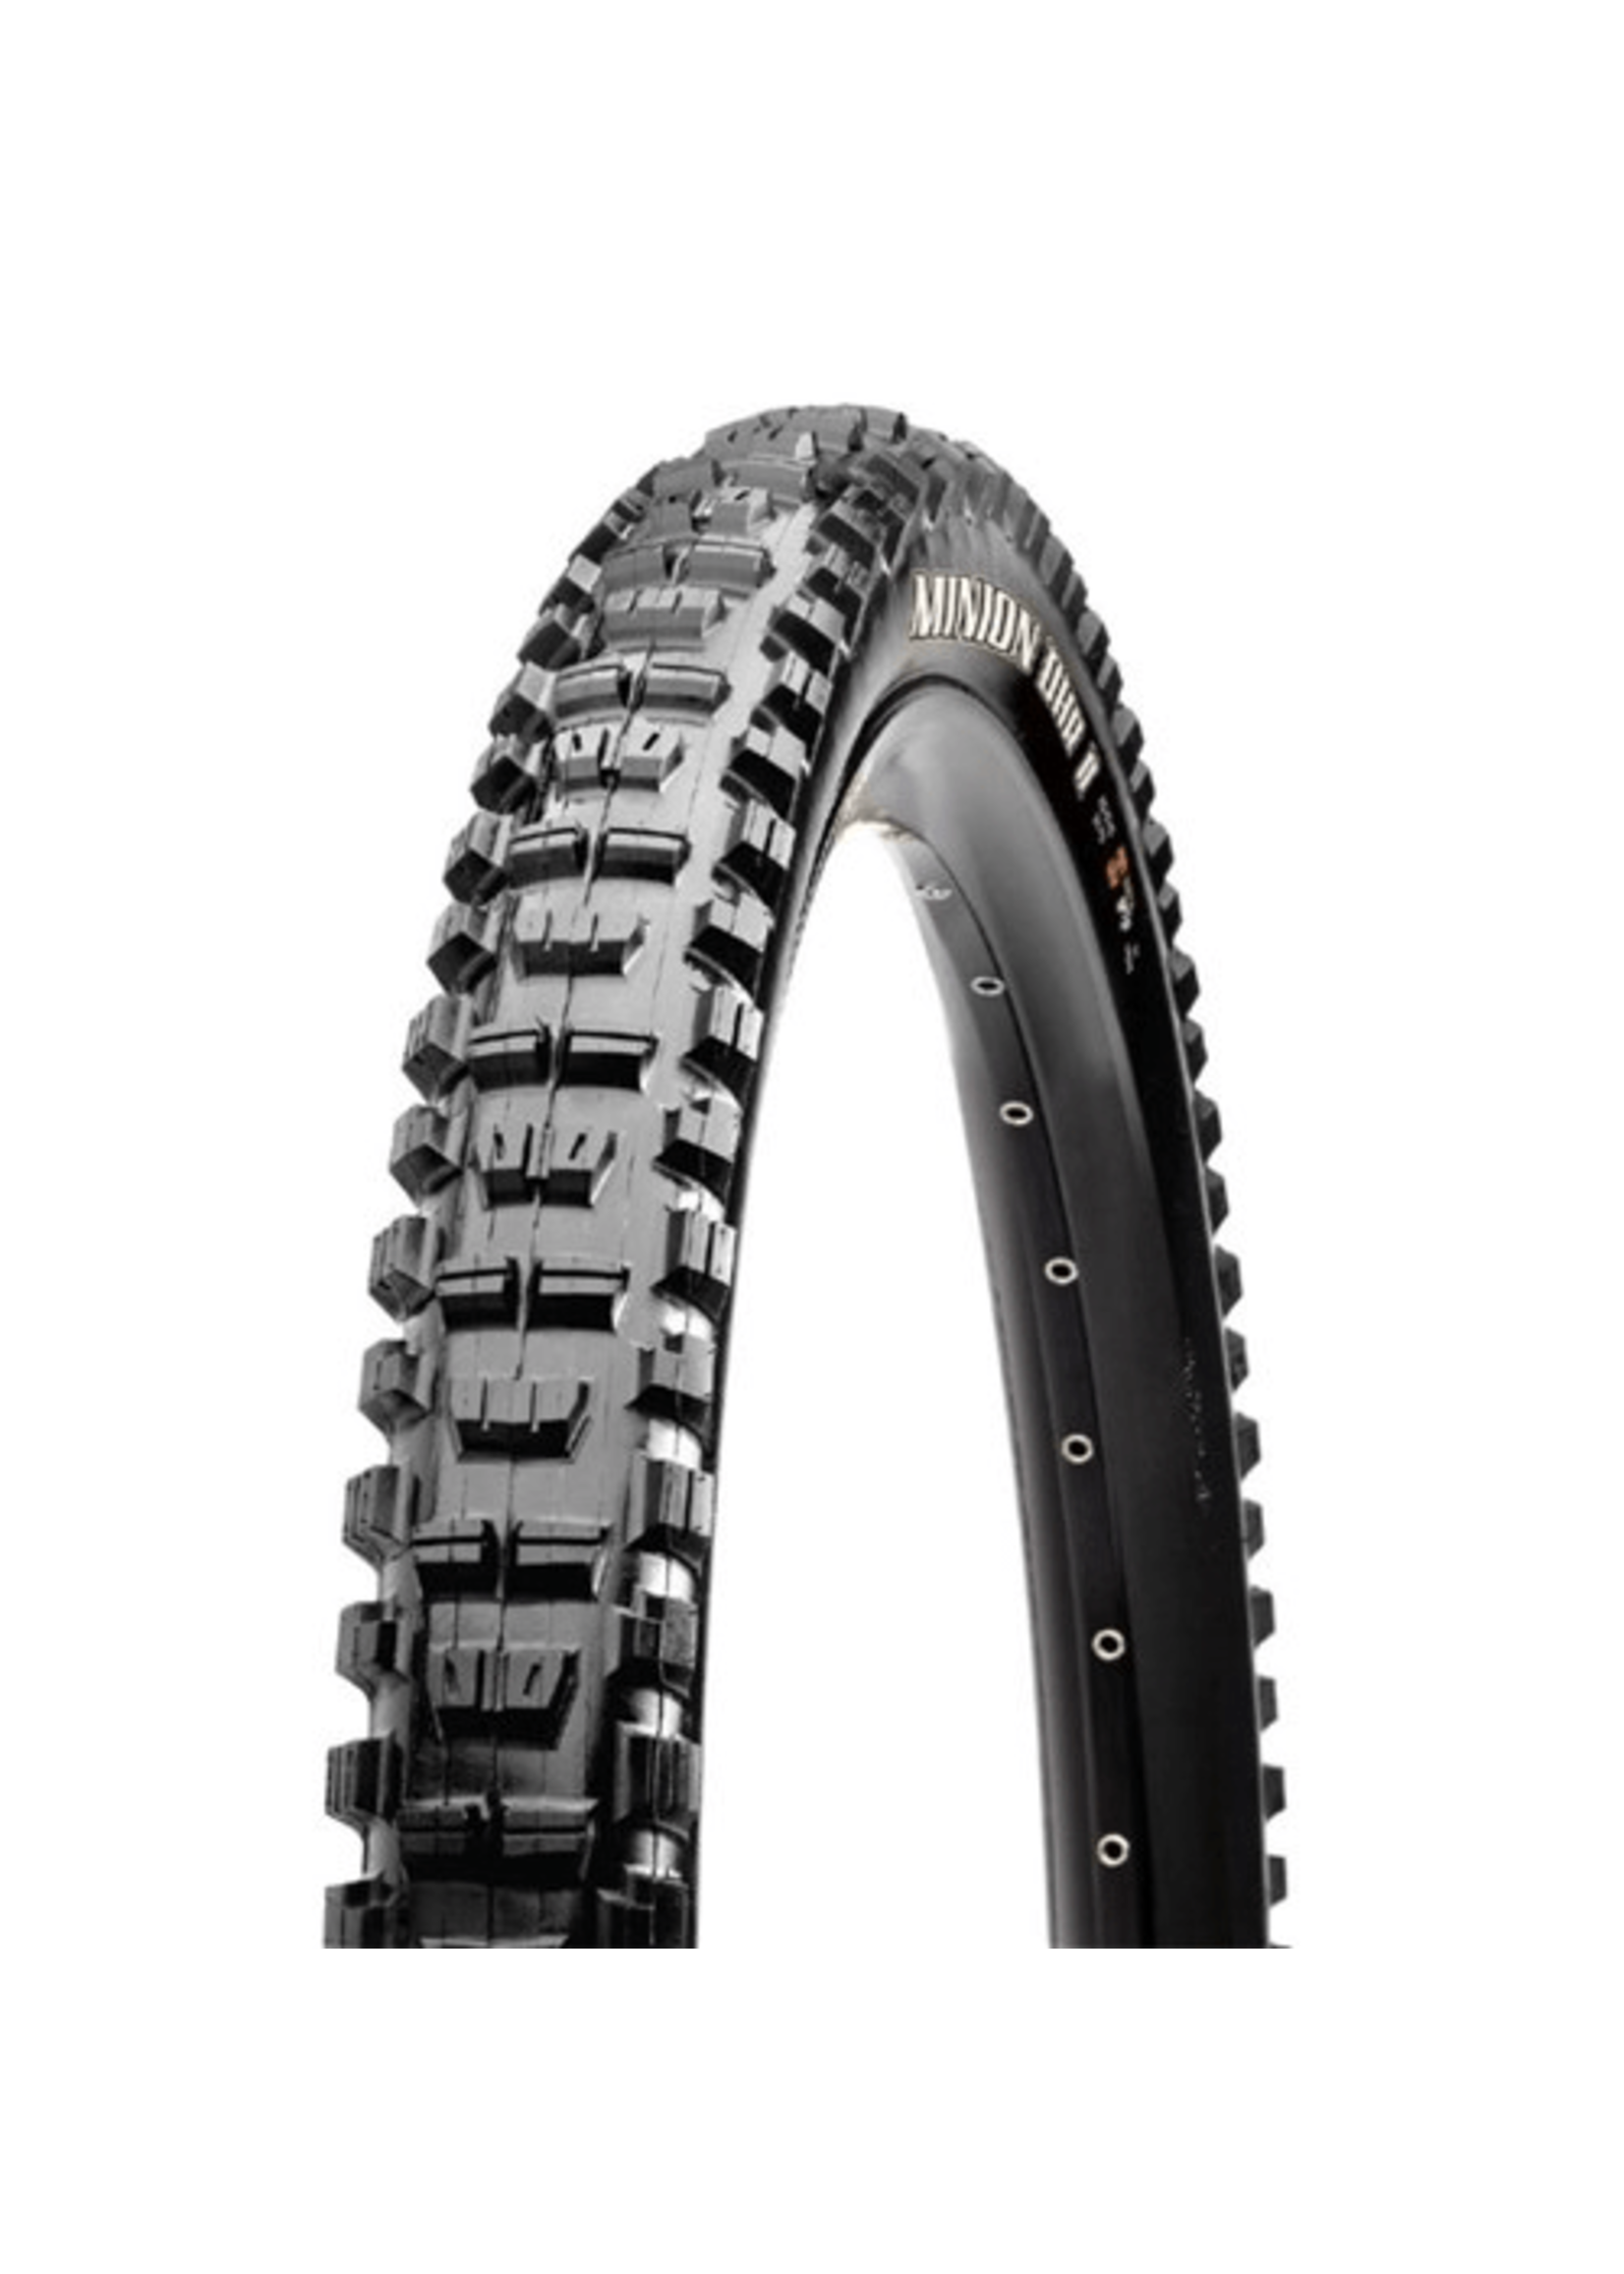 Maxxis Maxxis, Minion DHR2, Tire, 29''x2.60, Folding, Tubeless Ready, 3C Maxx Terra, EXO+, Wide Trail, 120TPI, Black